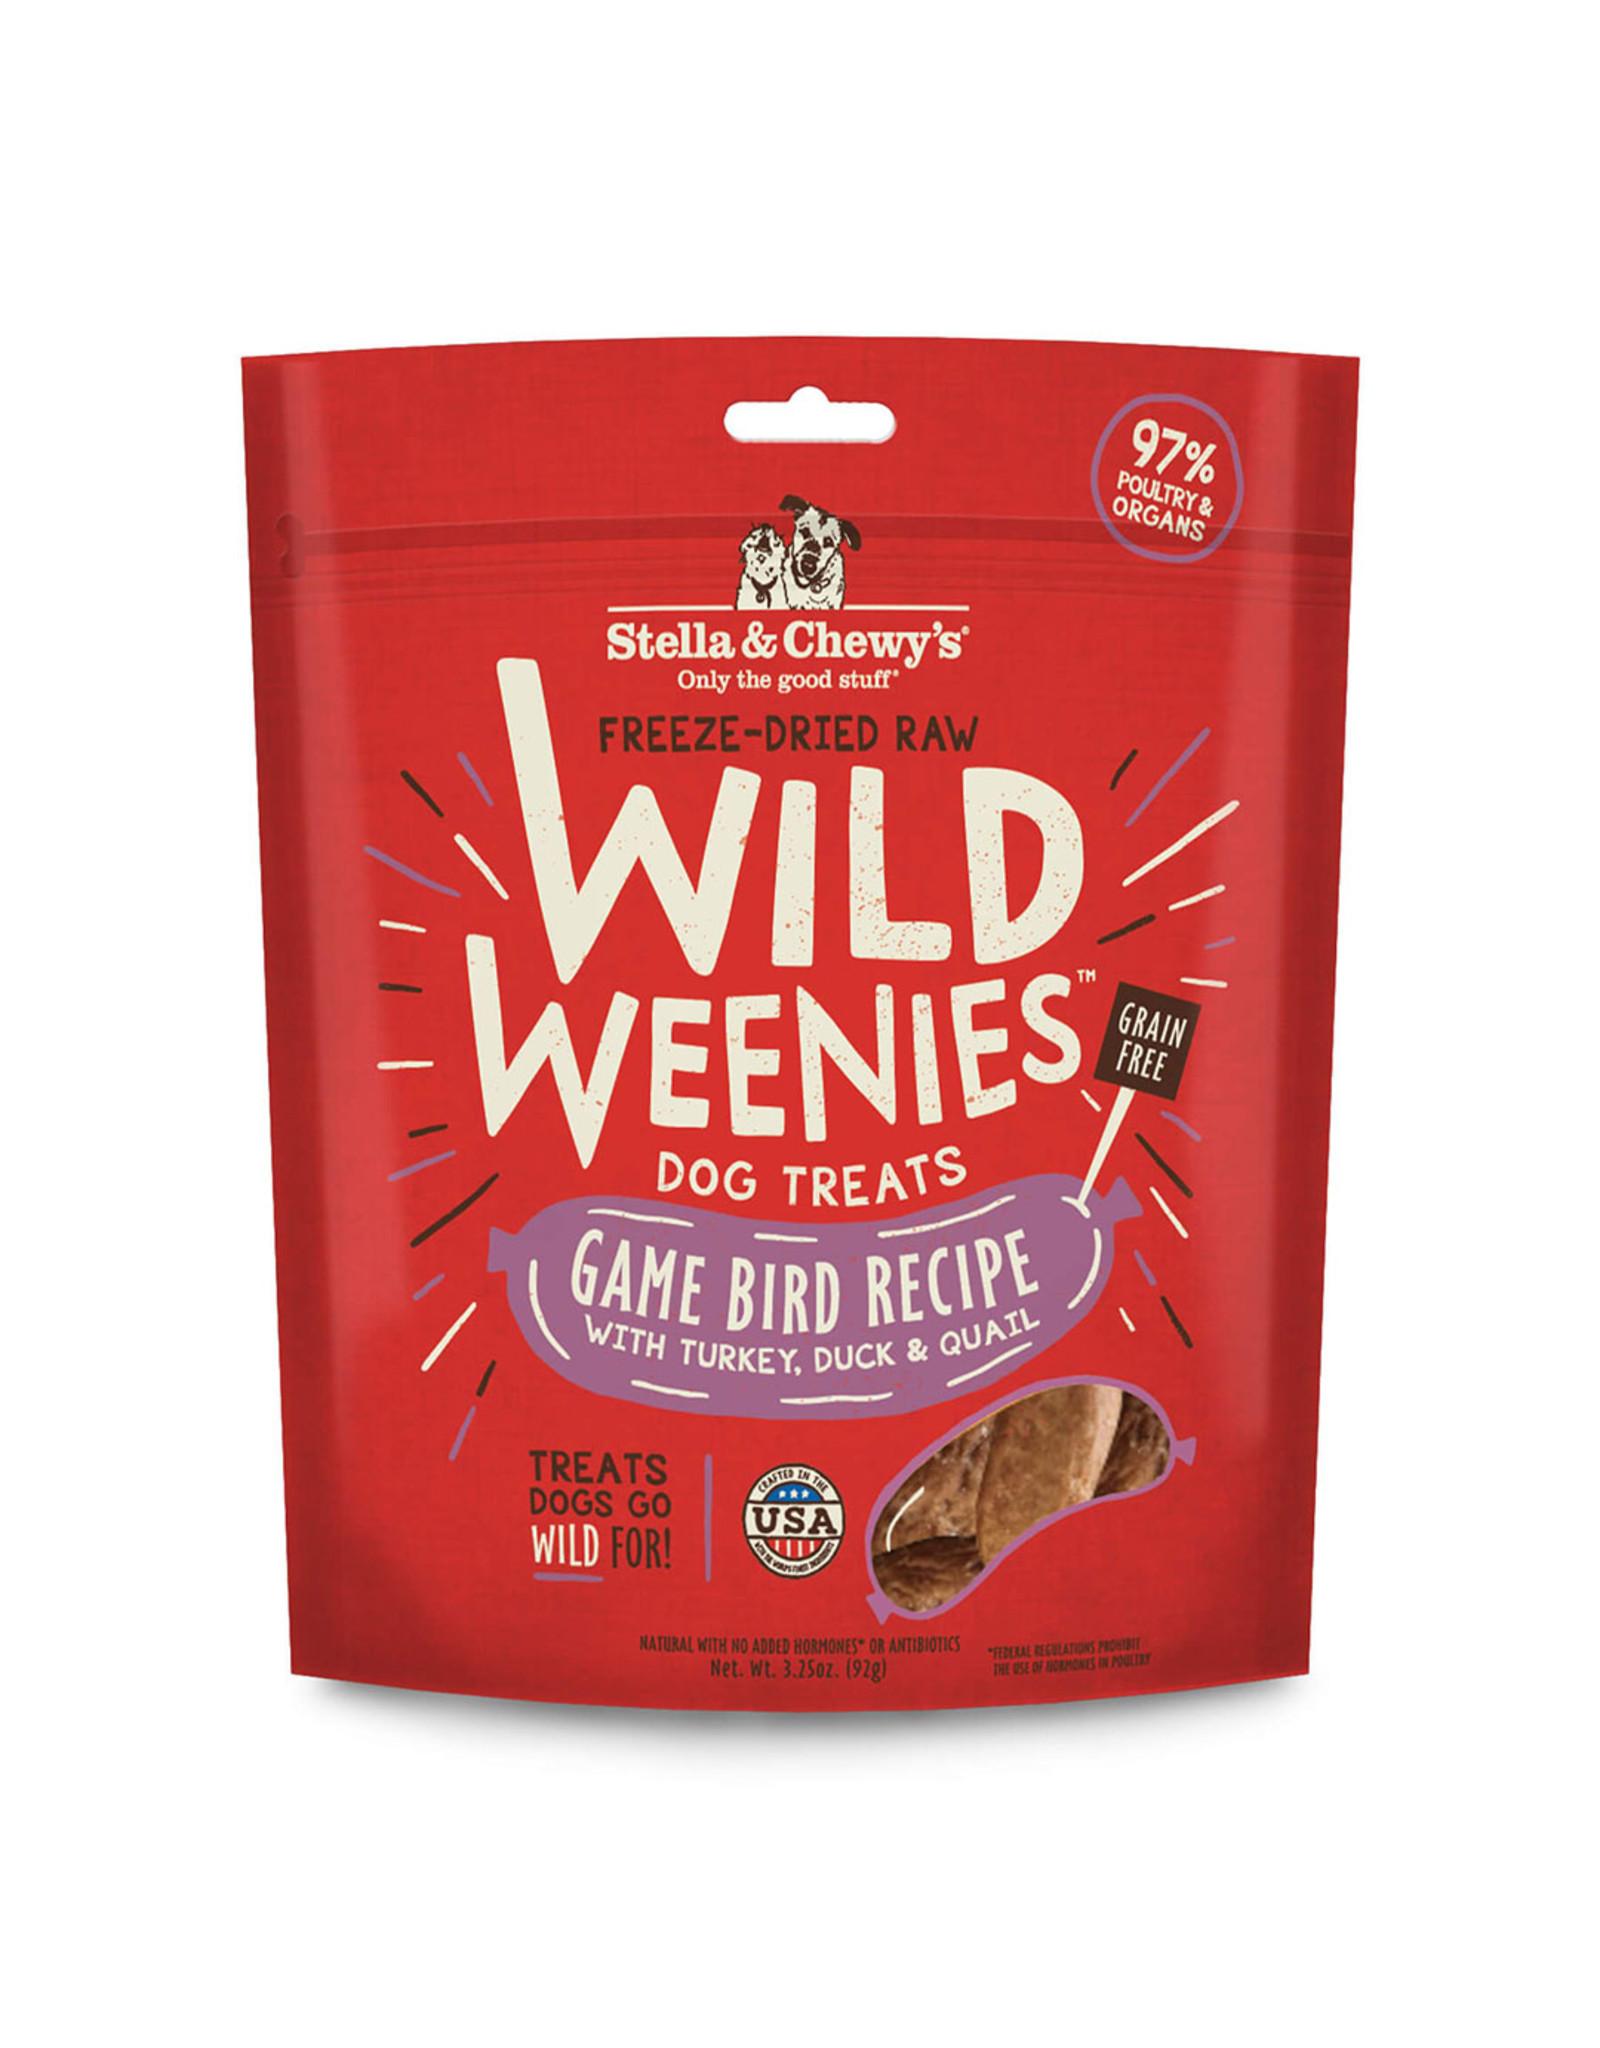 Stella & Chewy's Stella & Chewy's Wild Weenies Dog Treats Game Bird Recipe 3.25oz